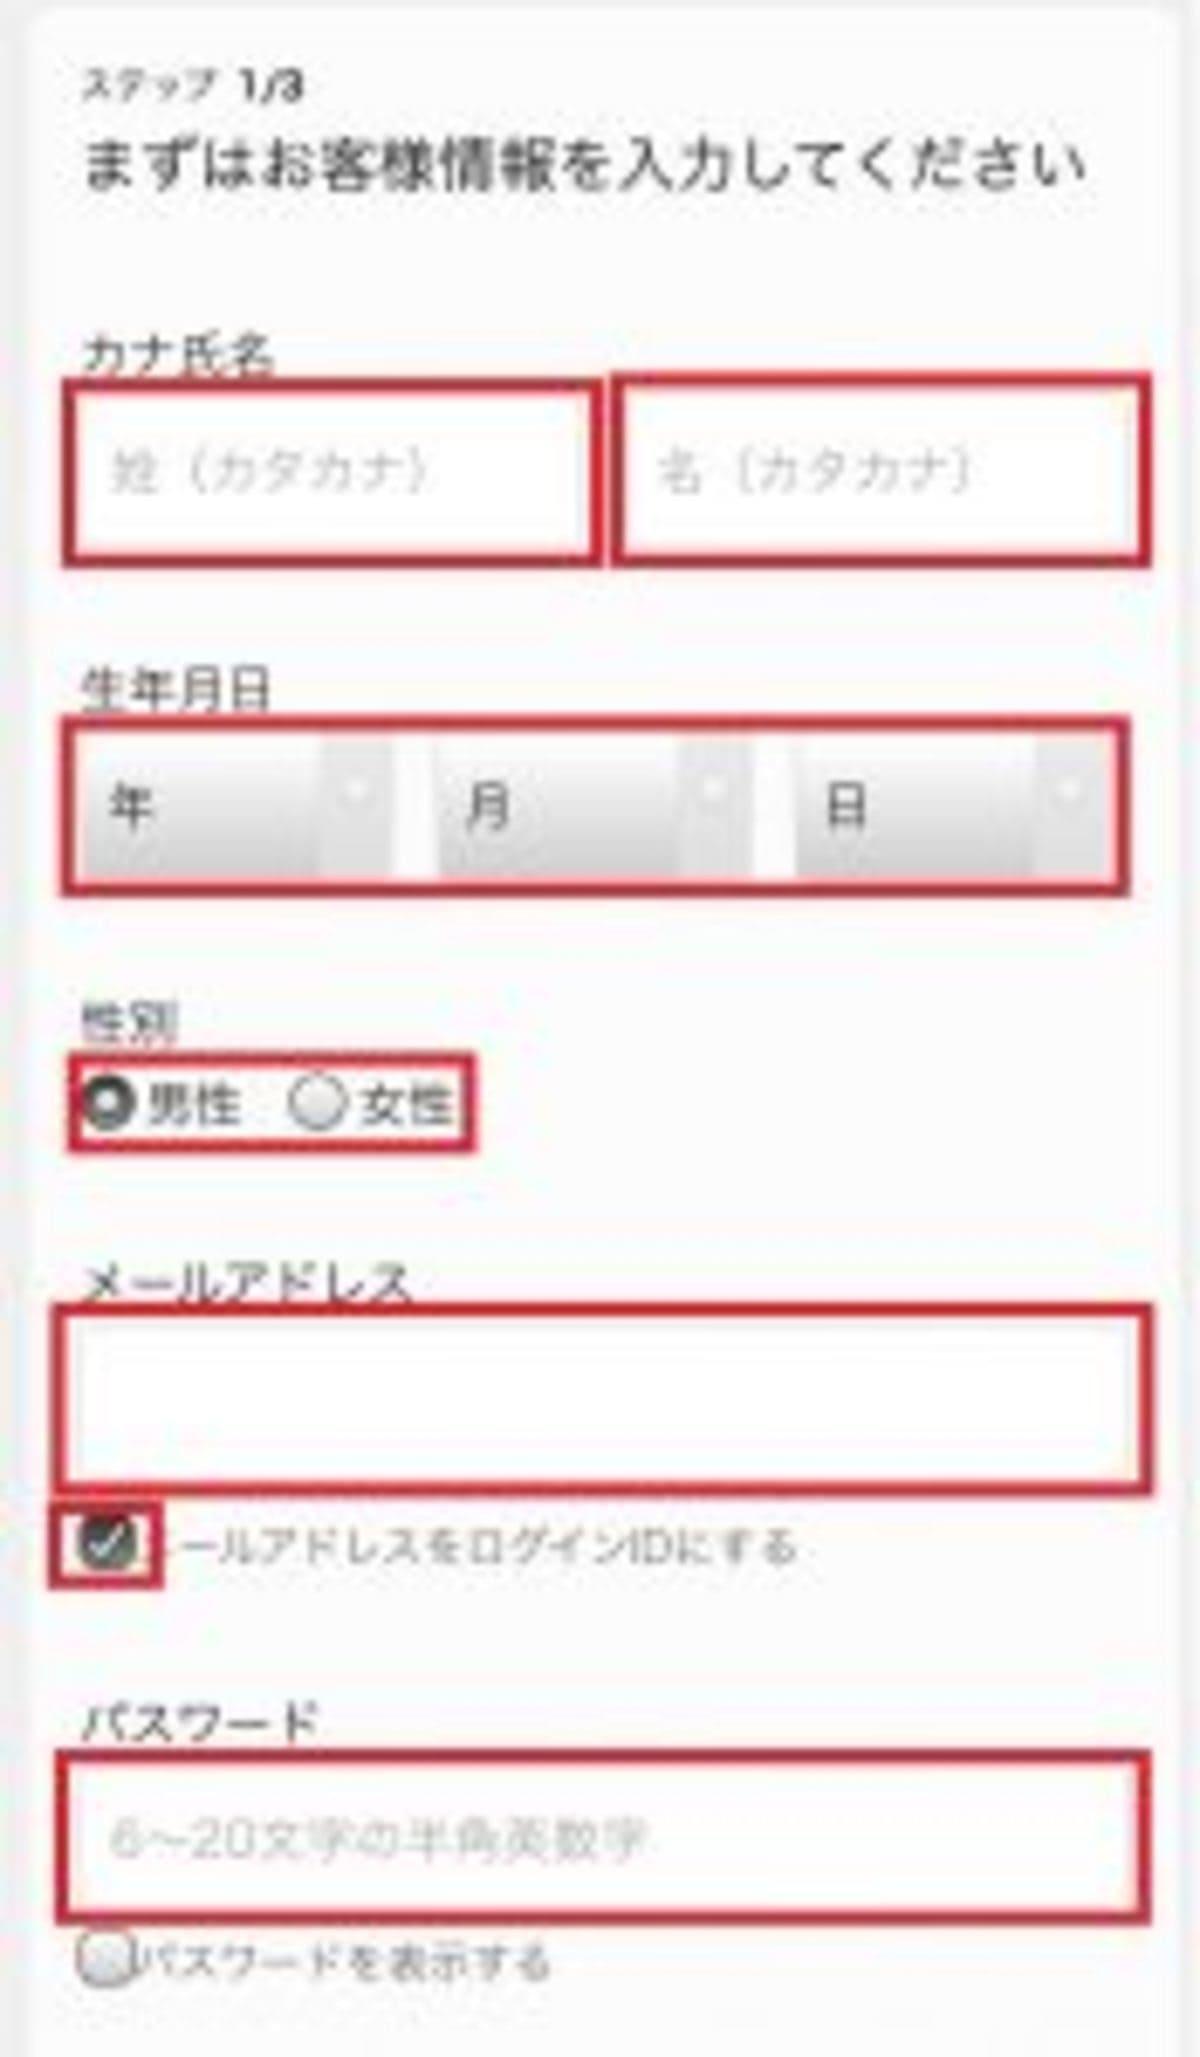 U-NEXTの登録画面の名前やメールアドレス入力画面